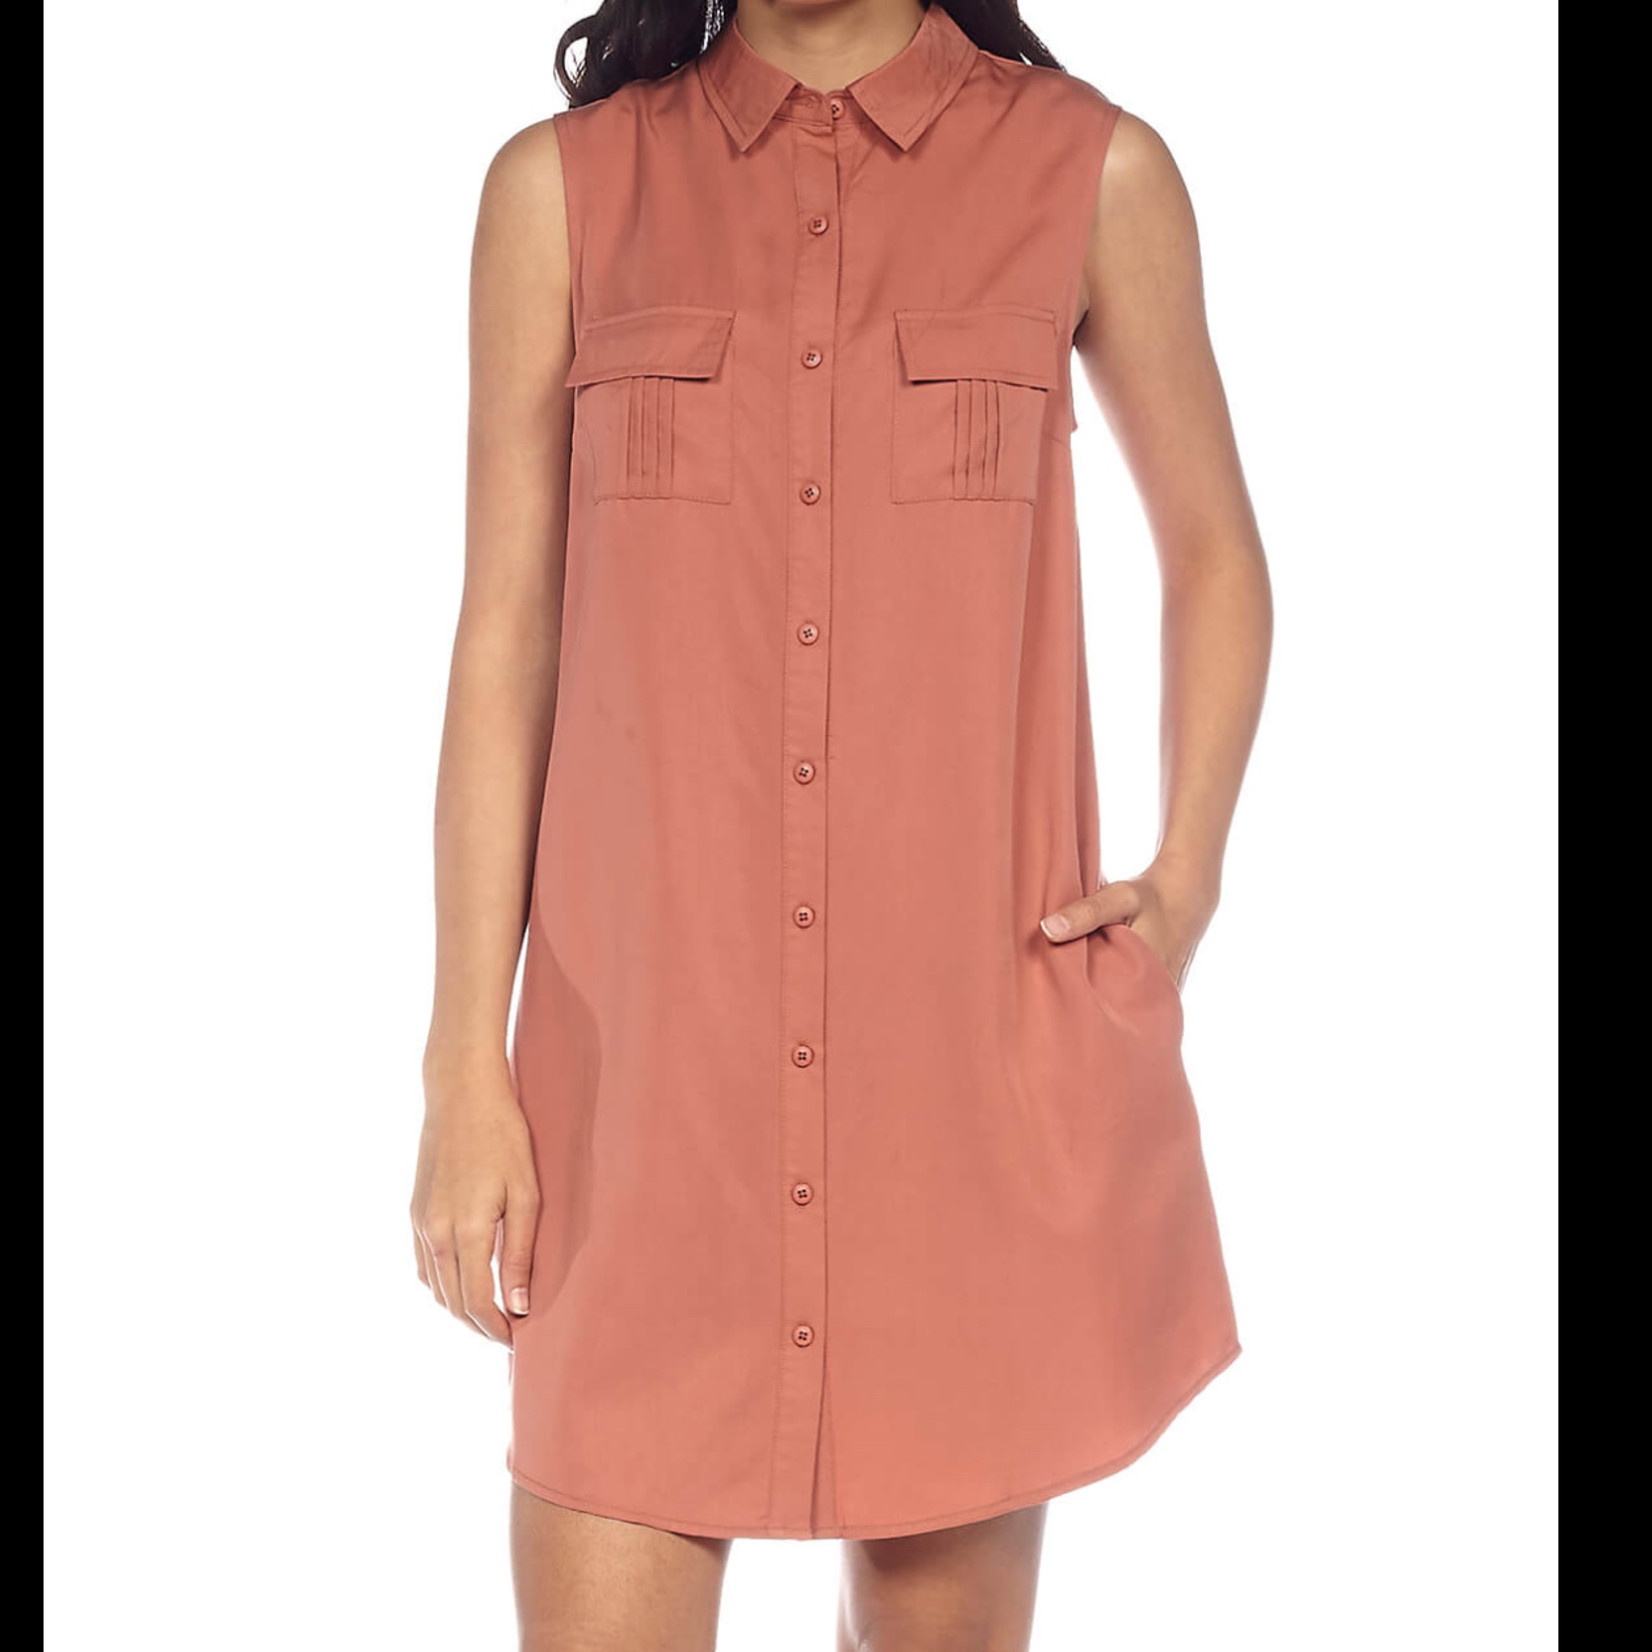 DKR & Company Sleeveless Shirt Dress CH-025